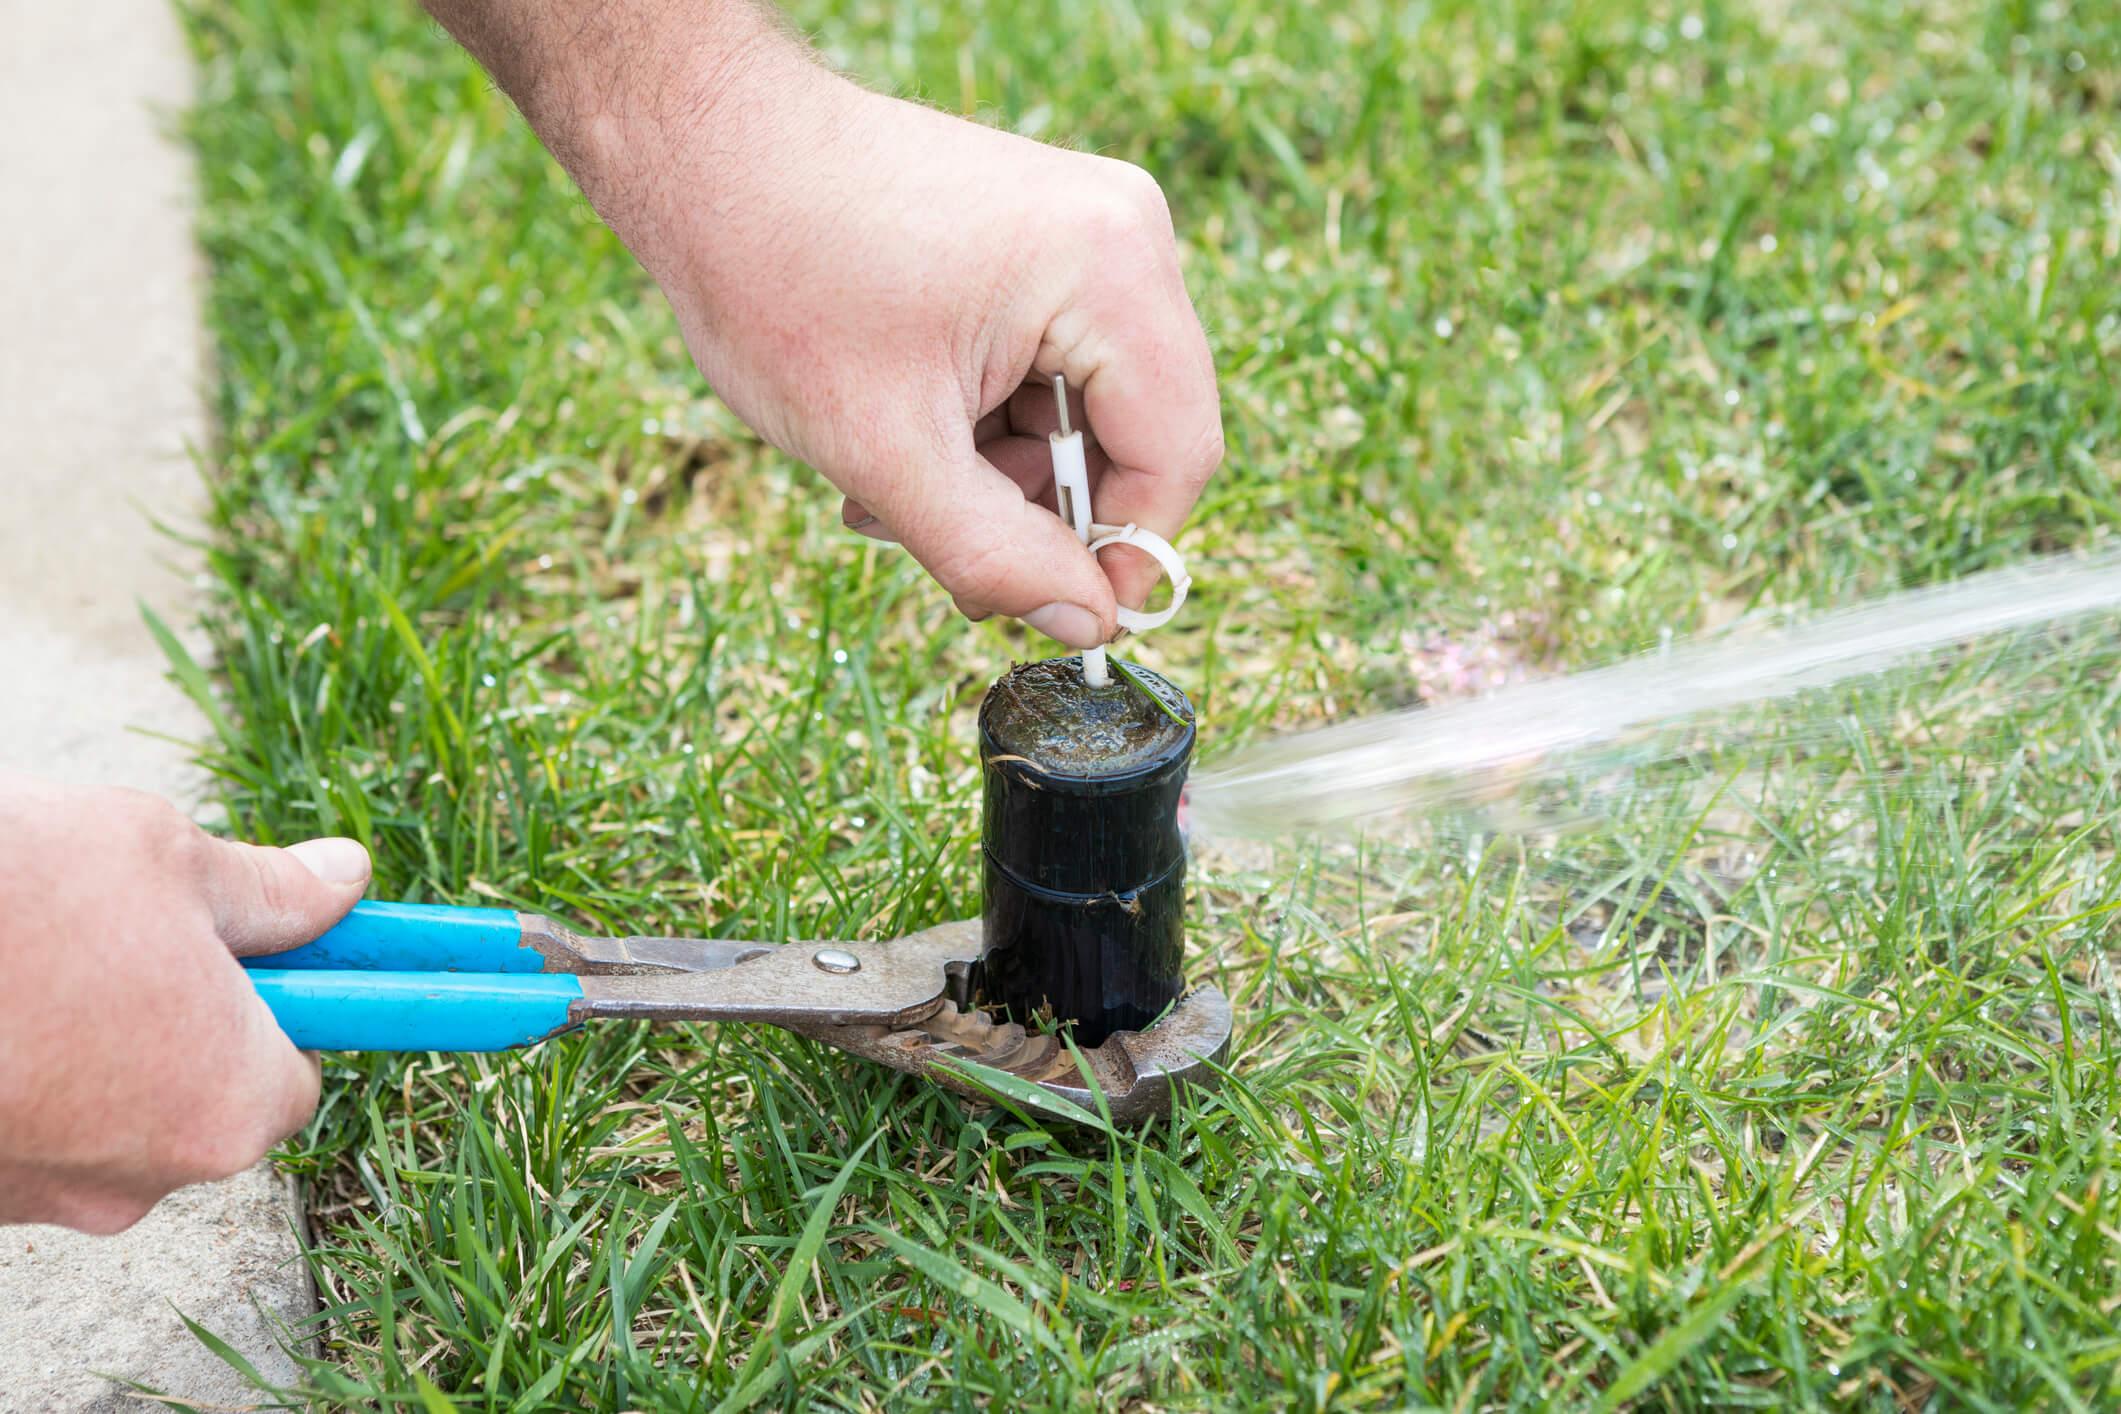 Common Summertime Sprinkler Repairs